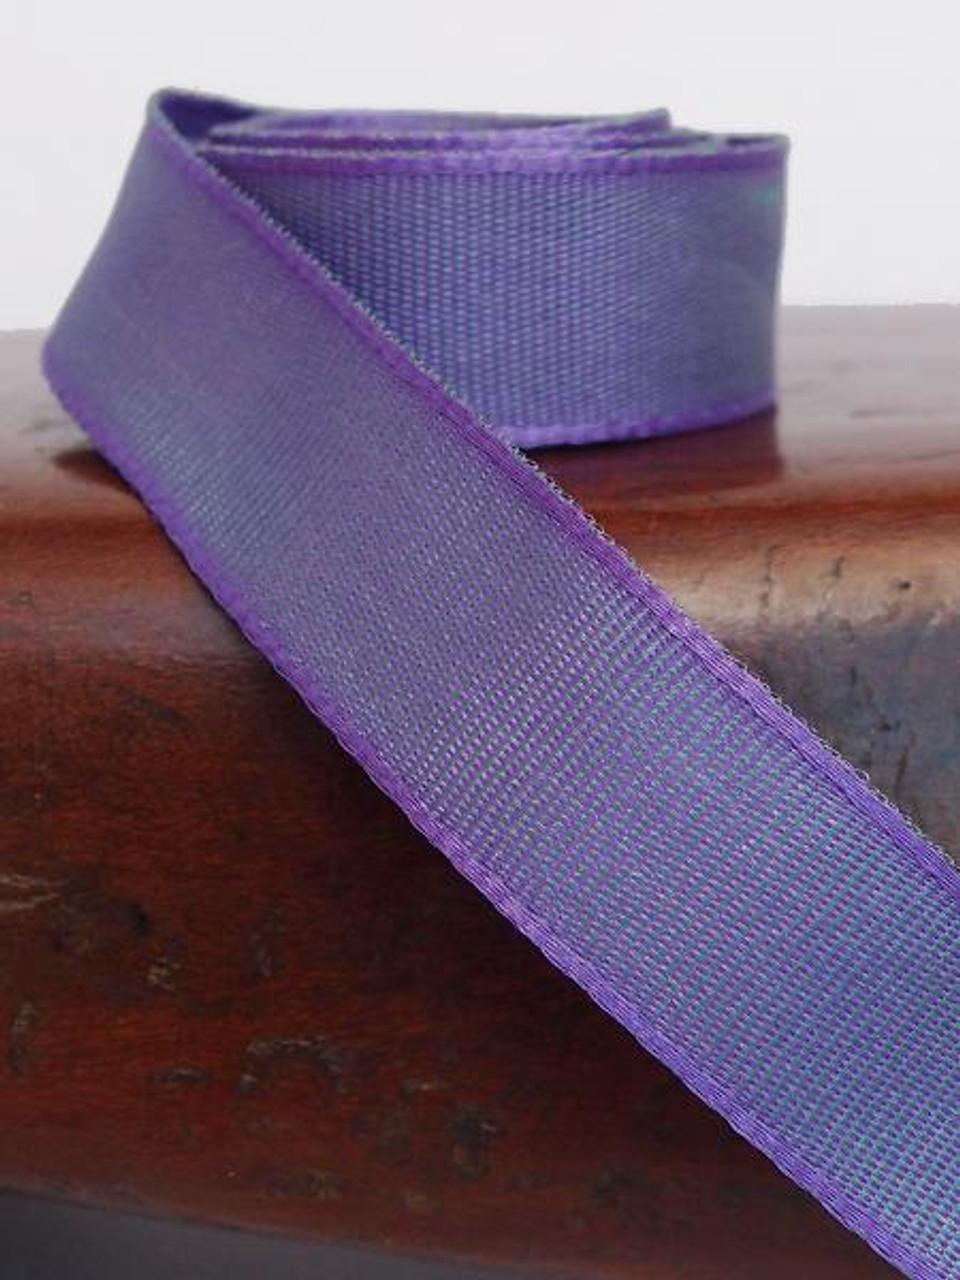 Delphinium Two-Toned Grosgrain Ribbon (2 sizes)